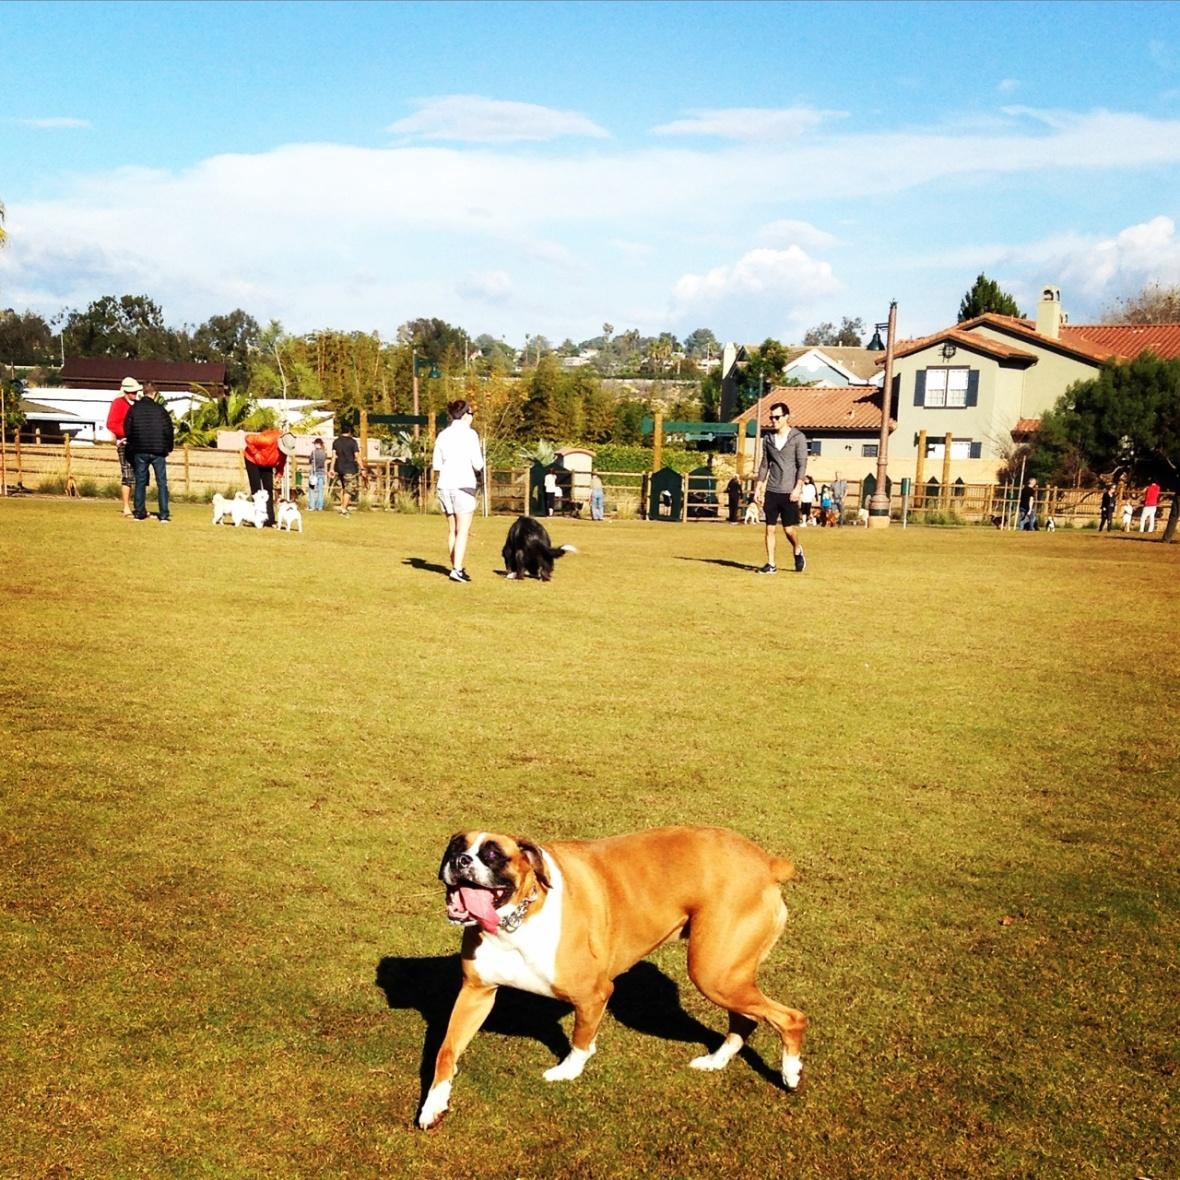 encinitas-dog-walkers-get-new-park